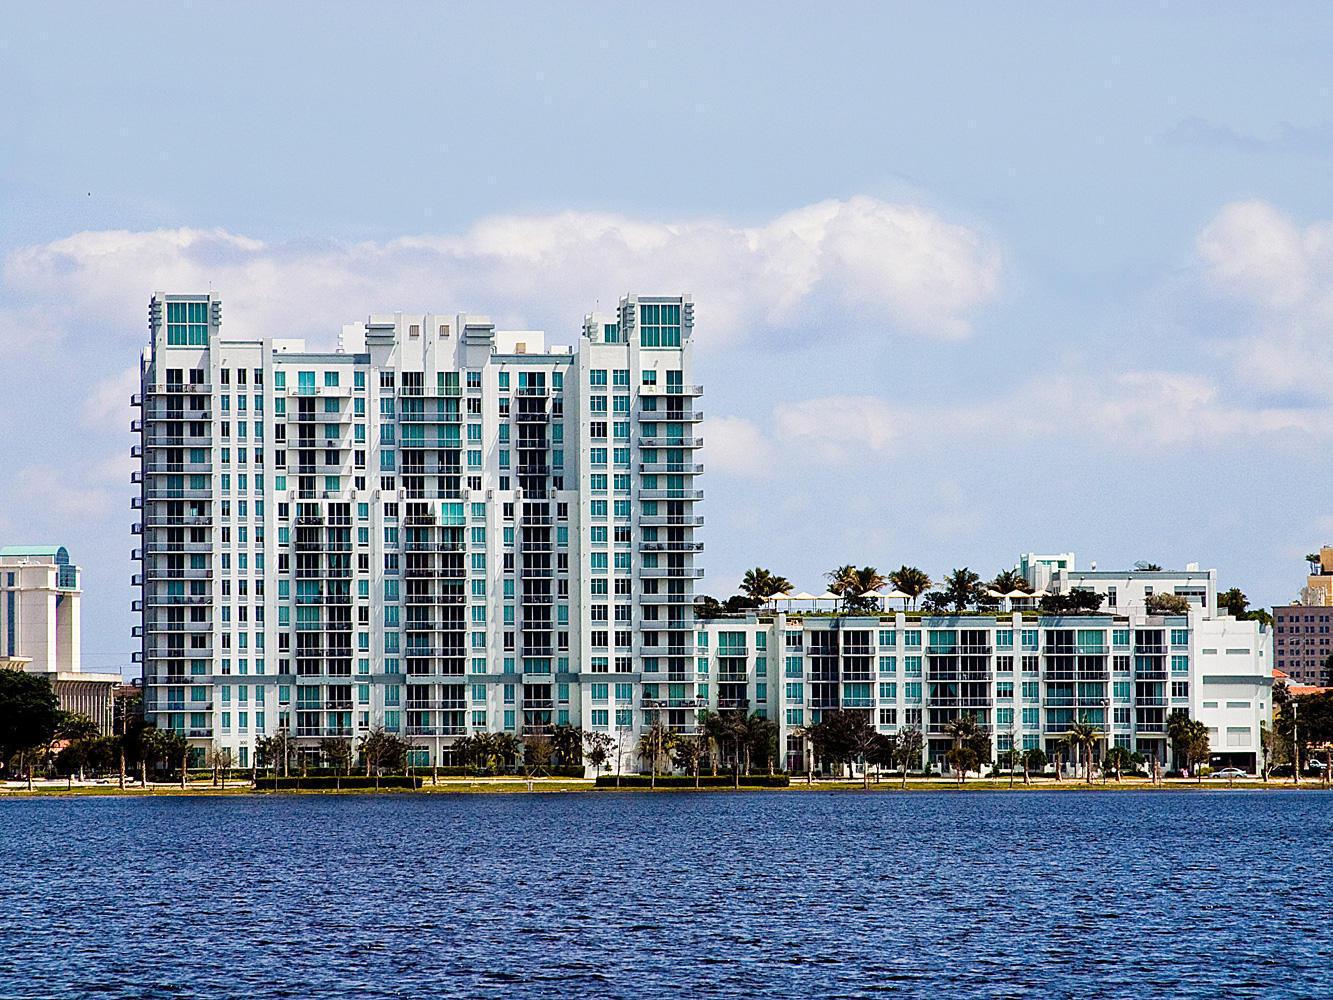 300 Australian Avenue, West Palm Beach, Florida 33401, 1 Bedroom Bedrooms, ,1 BathroomBathrooms,Condo/Coop,For Sale,Australian,7,RX-10466016